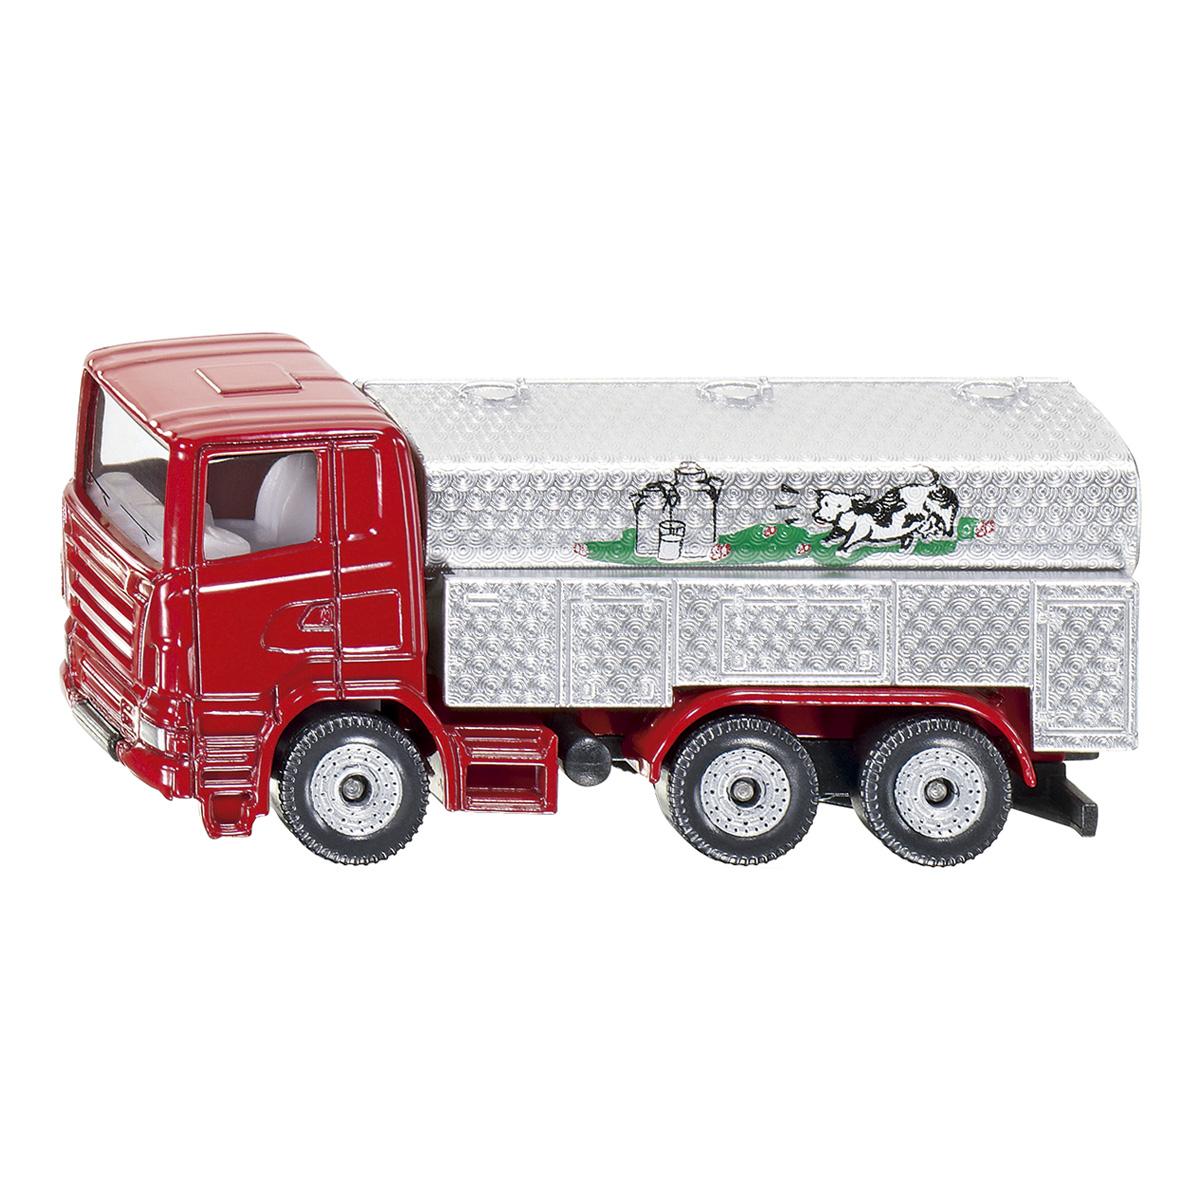 牛乳収集車(ジク・SIKU)